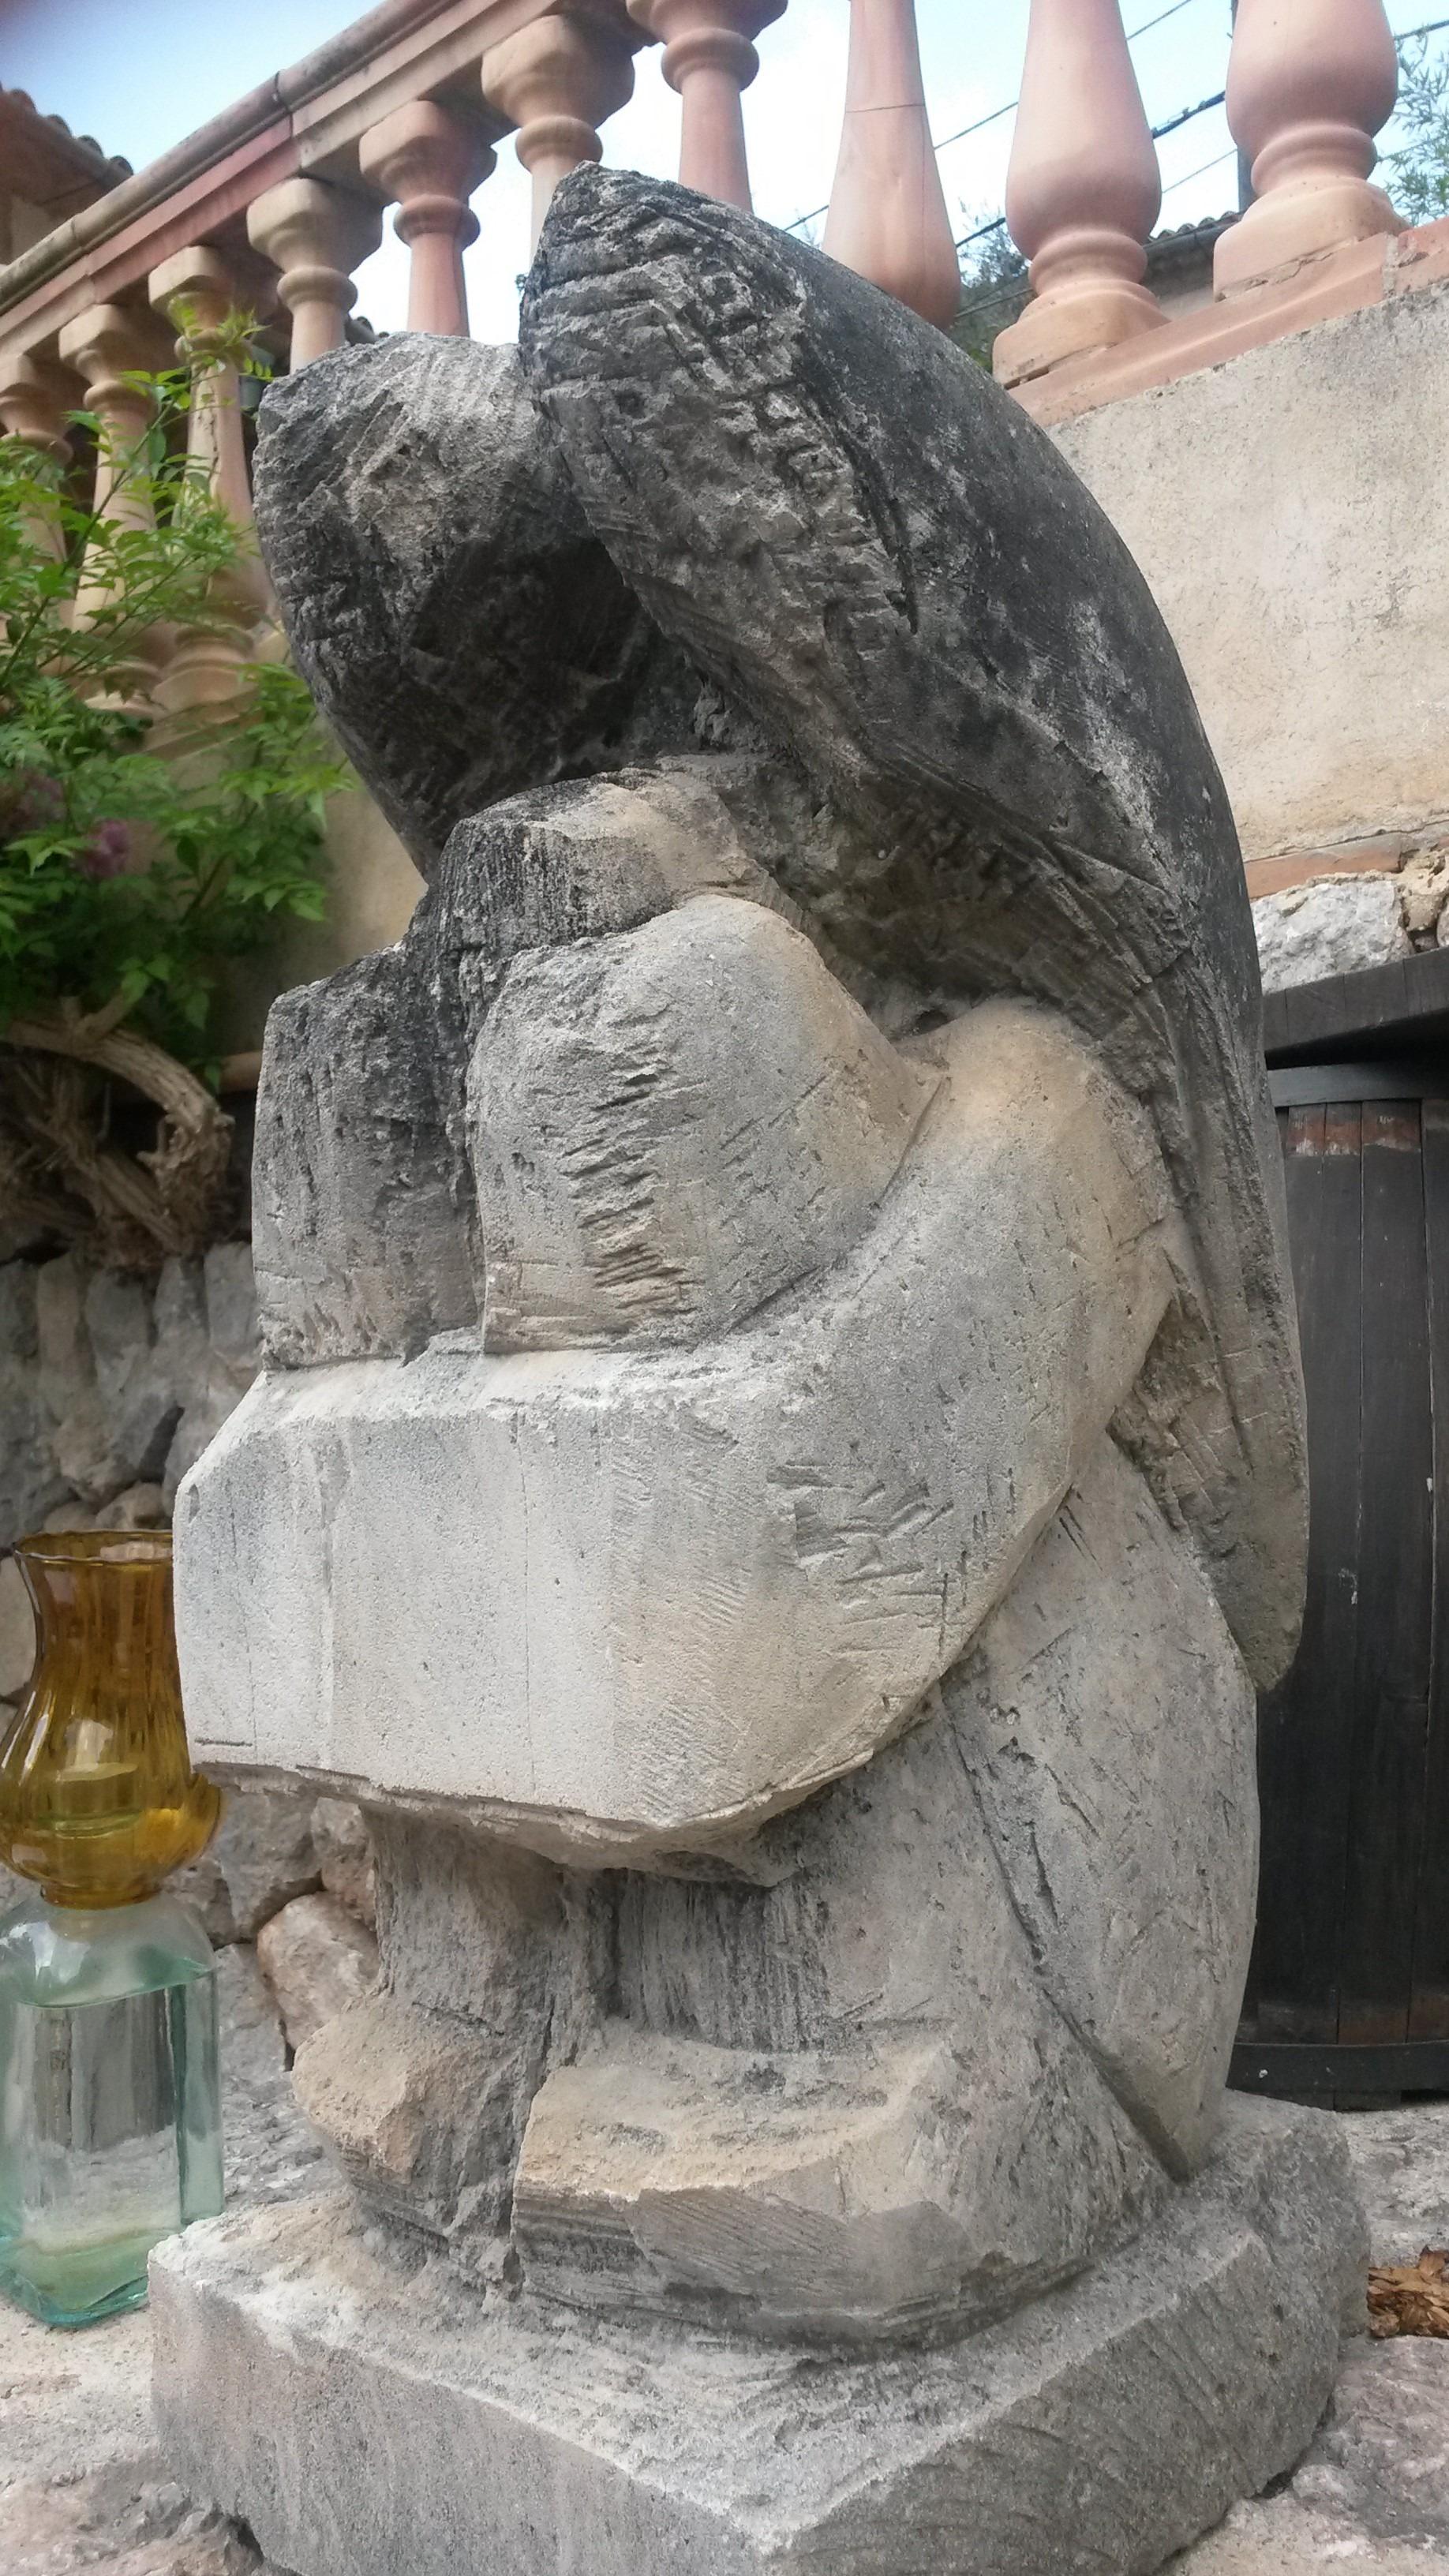 rock piedra monumento estatua escultura ngel art templo tallado fuente de agua estela sitio arqueolgico esculpir